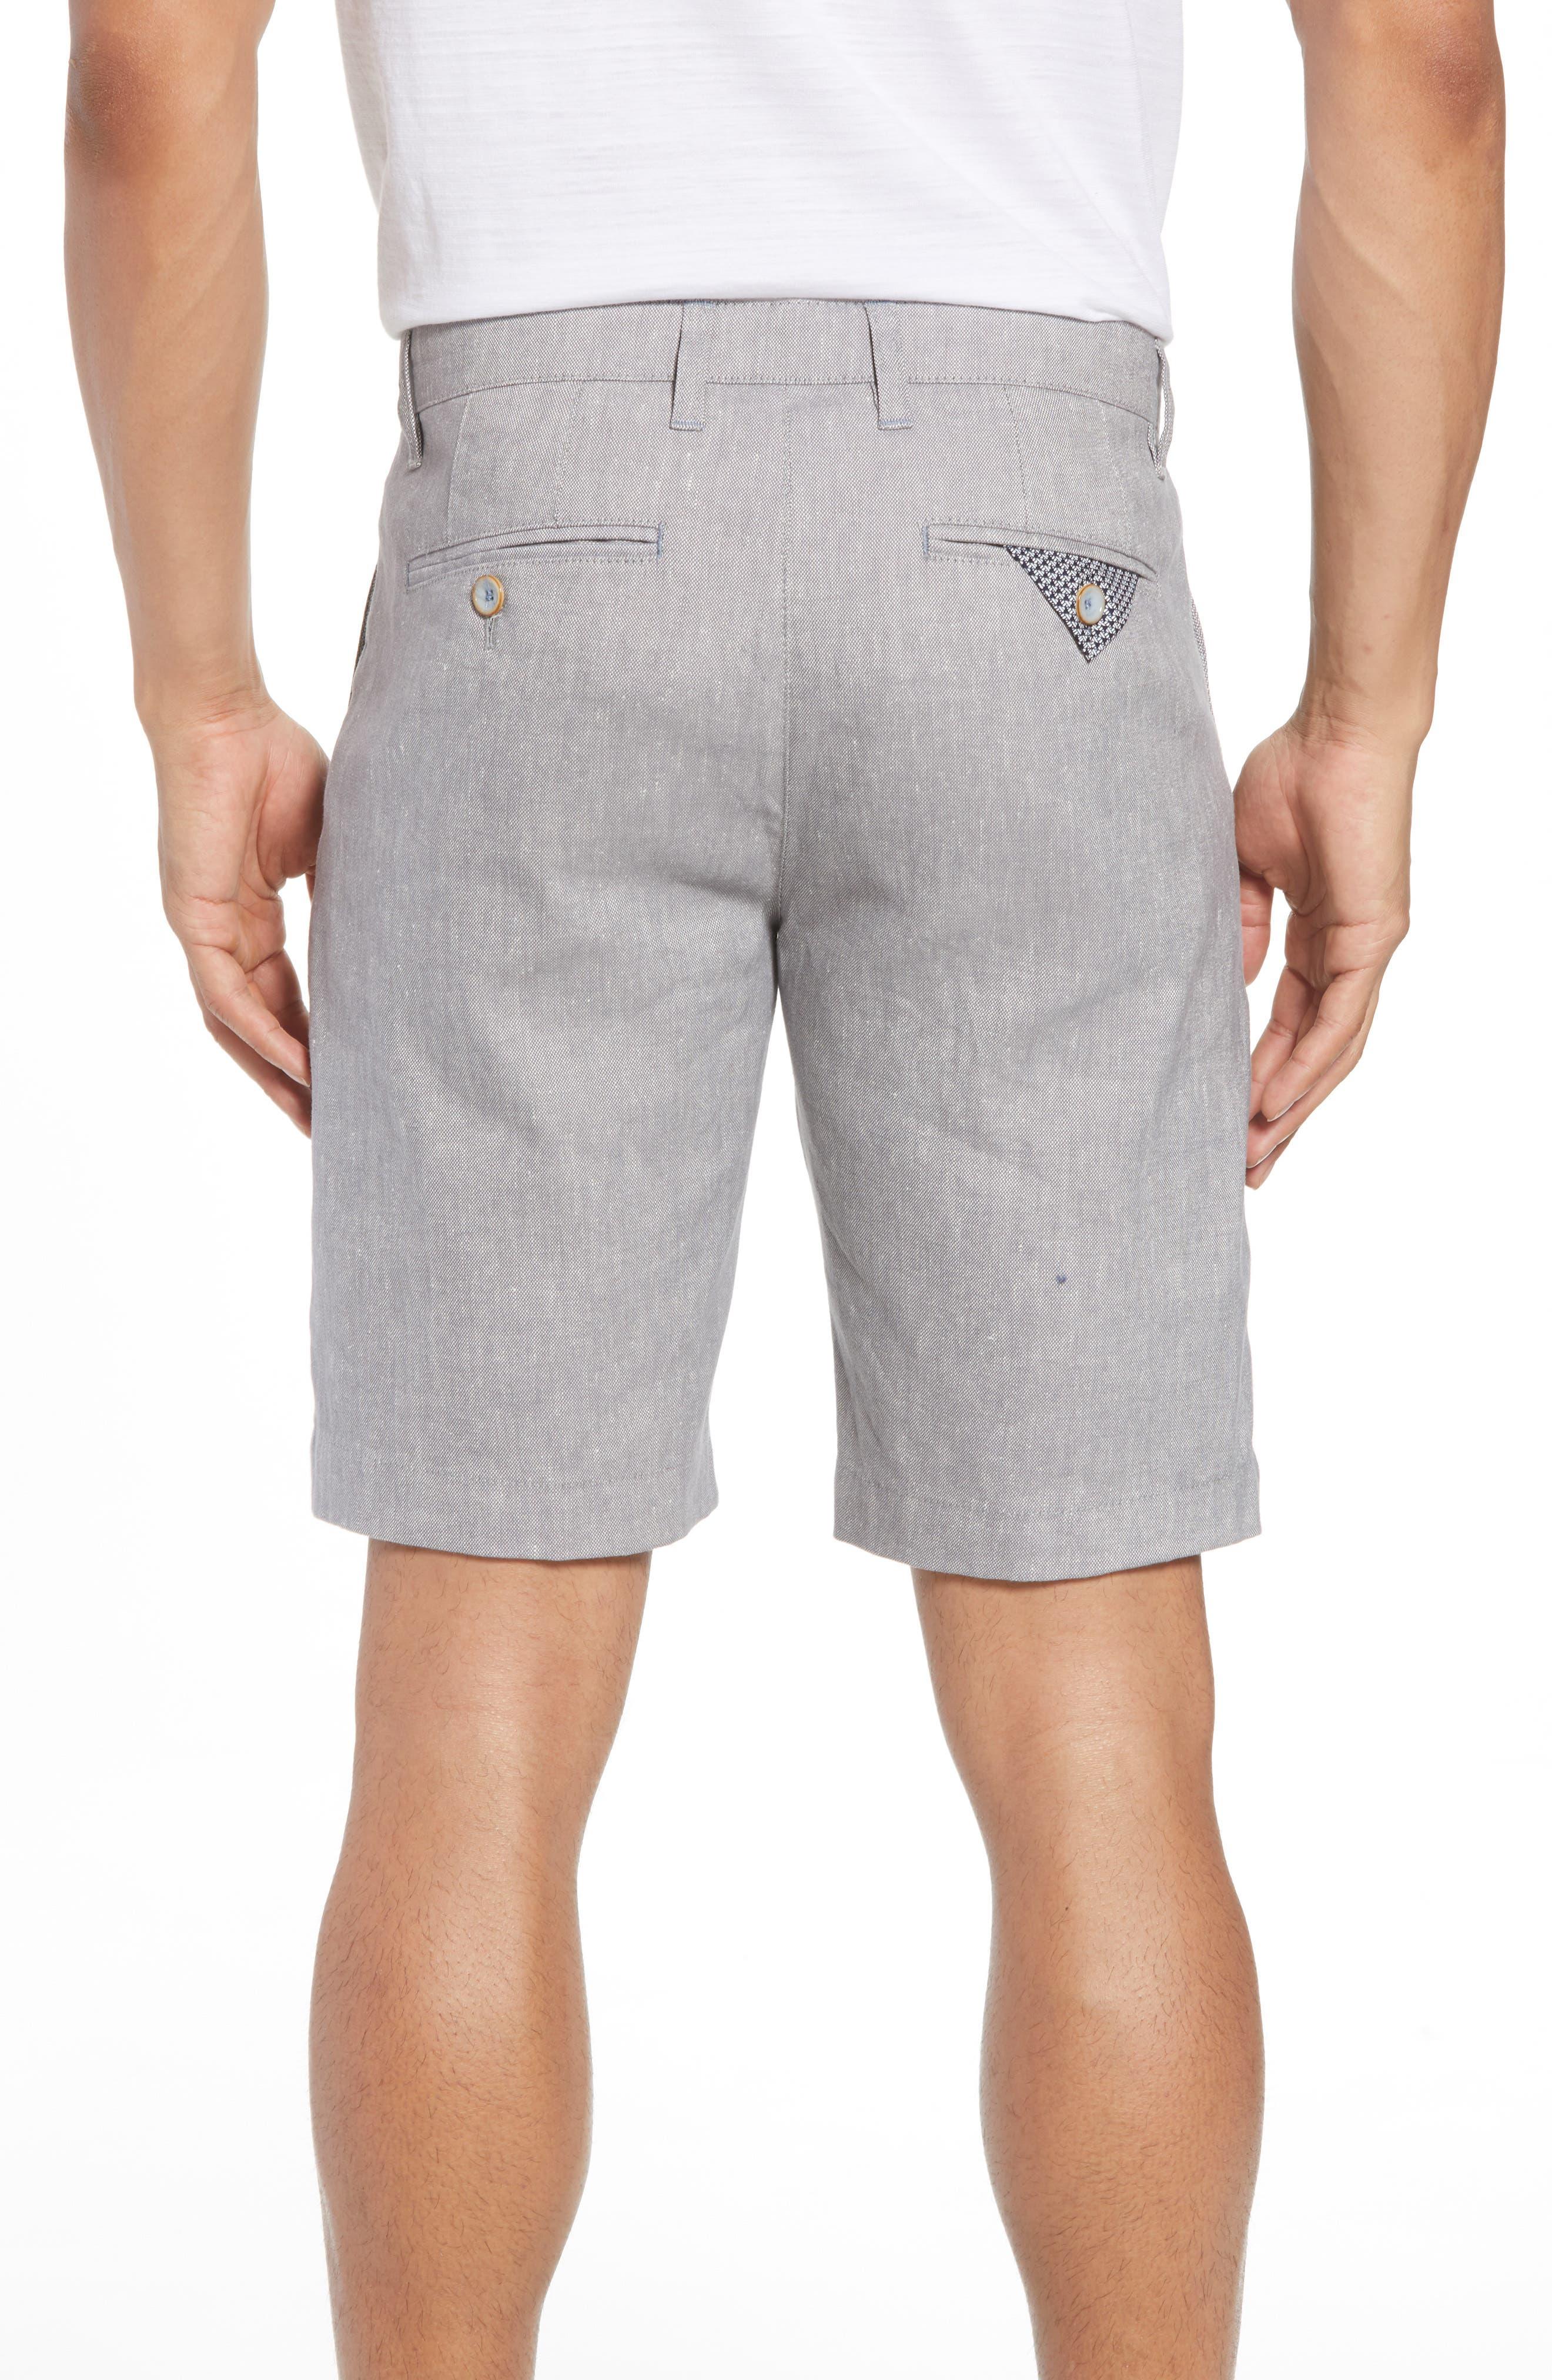 Newshow Flat Front Stretch Cotton Blend Shorts,                             Alternate thumbnail 2, color,                             GREY